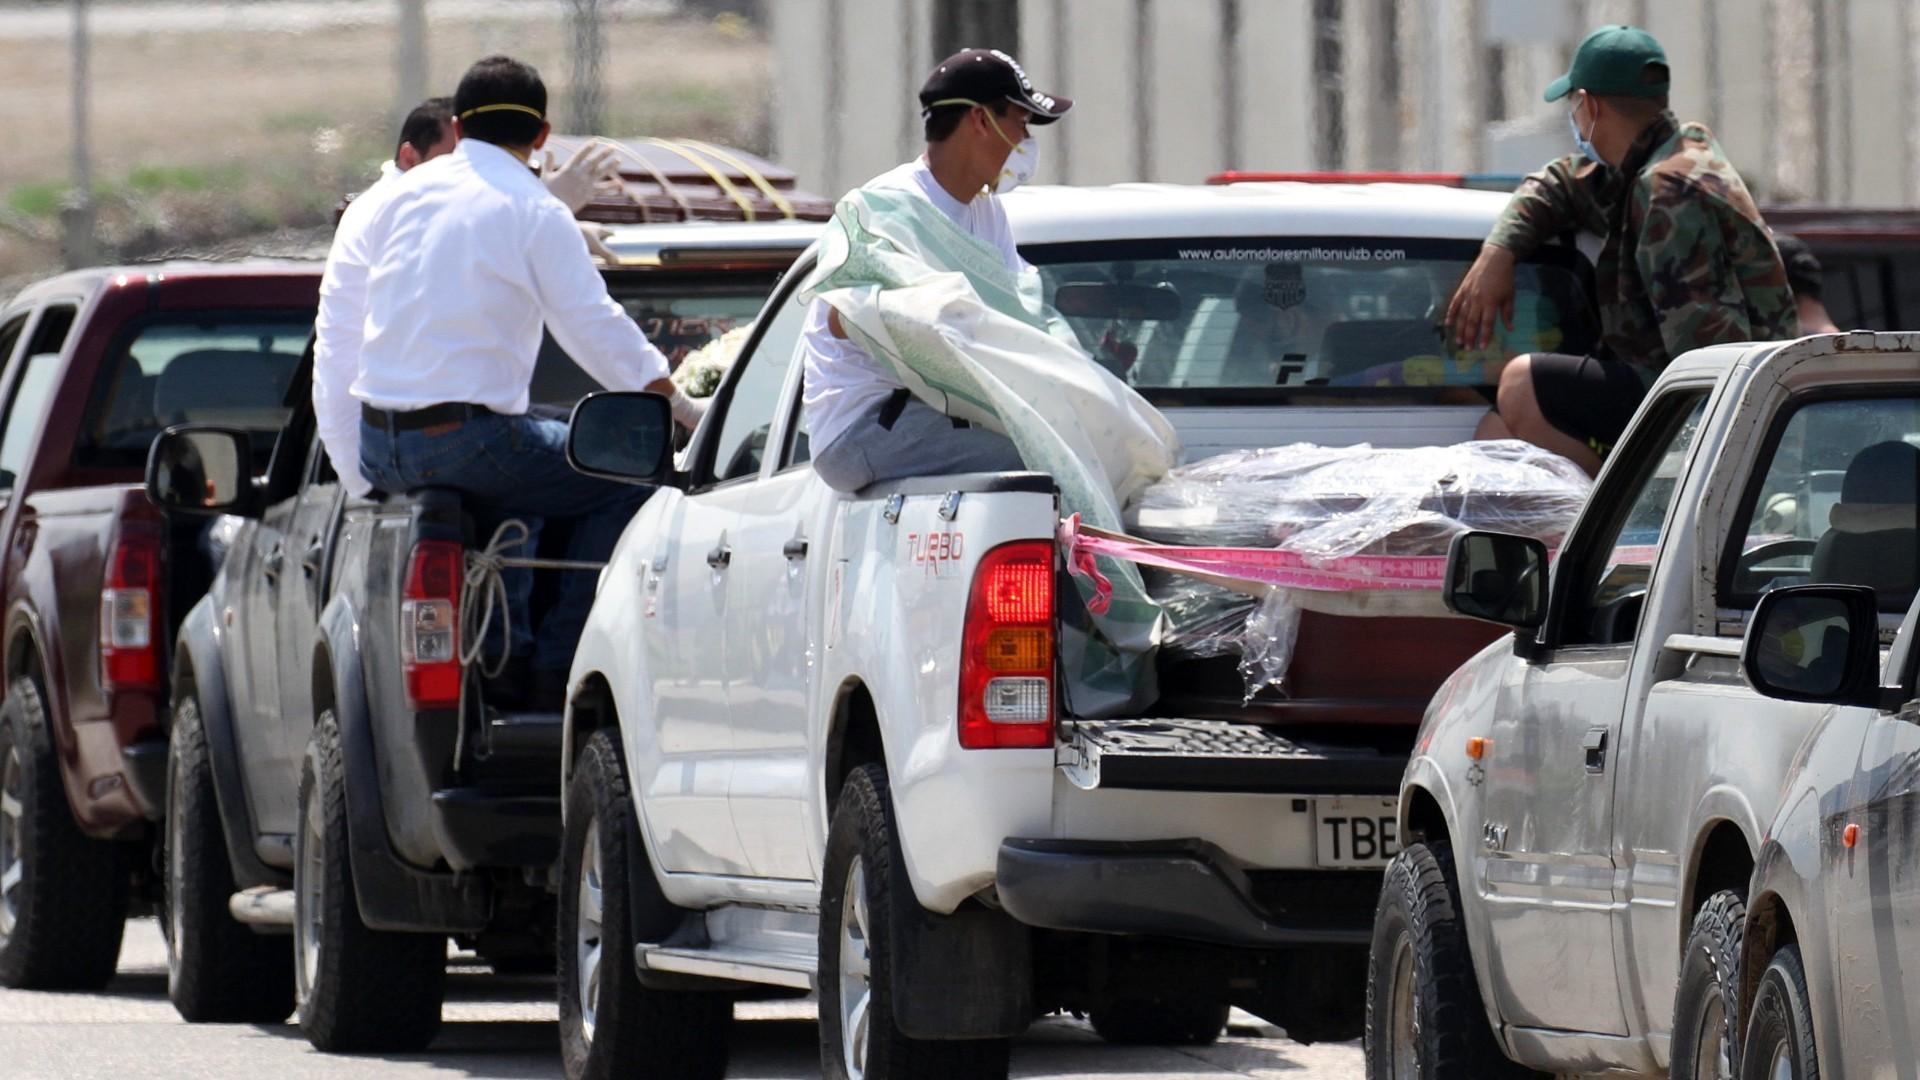 COVID-19: Ecuador struggles to bury the dead as bodies pile up